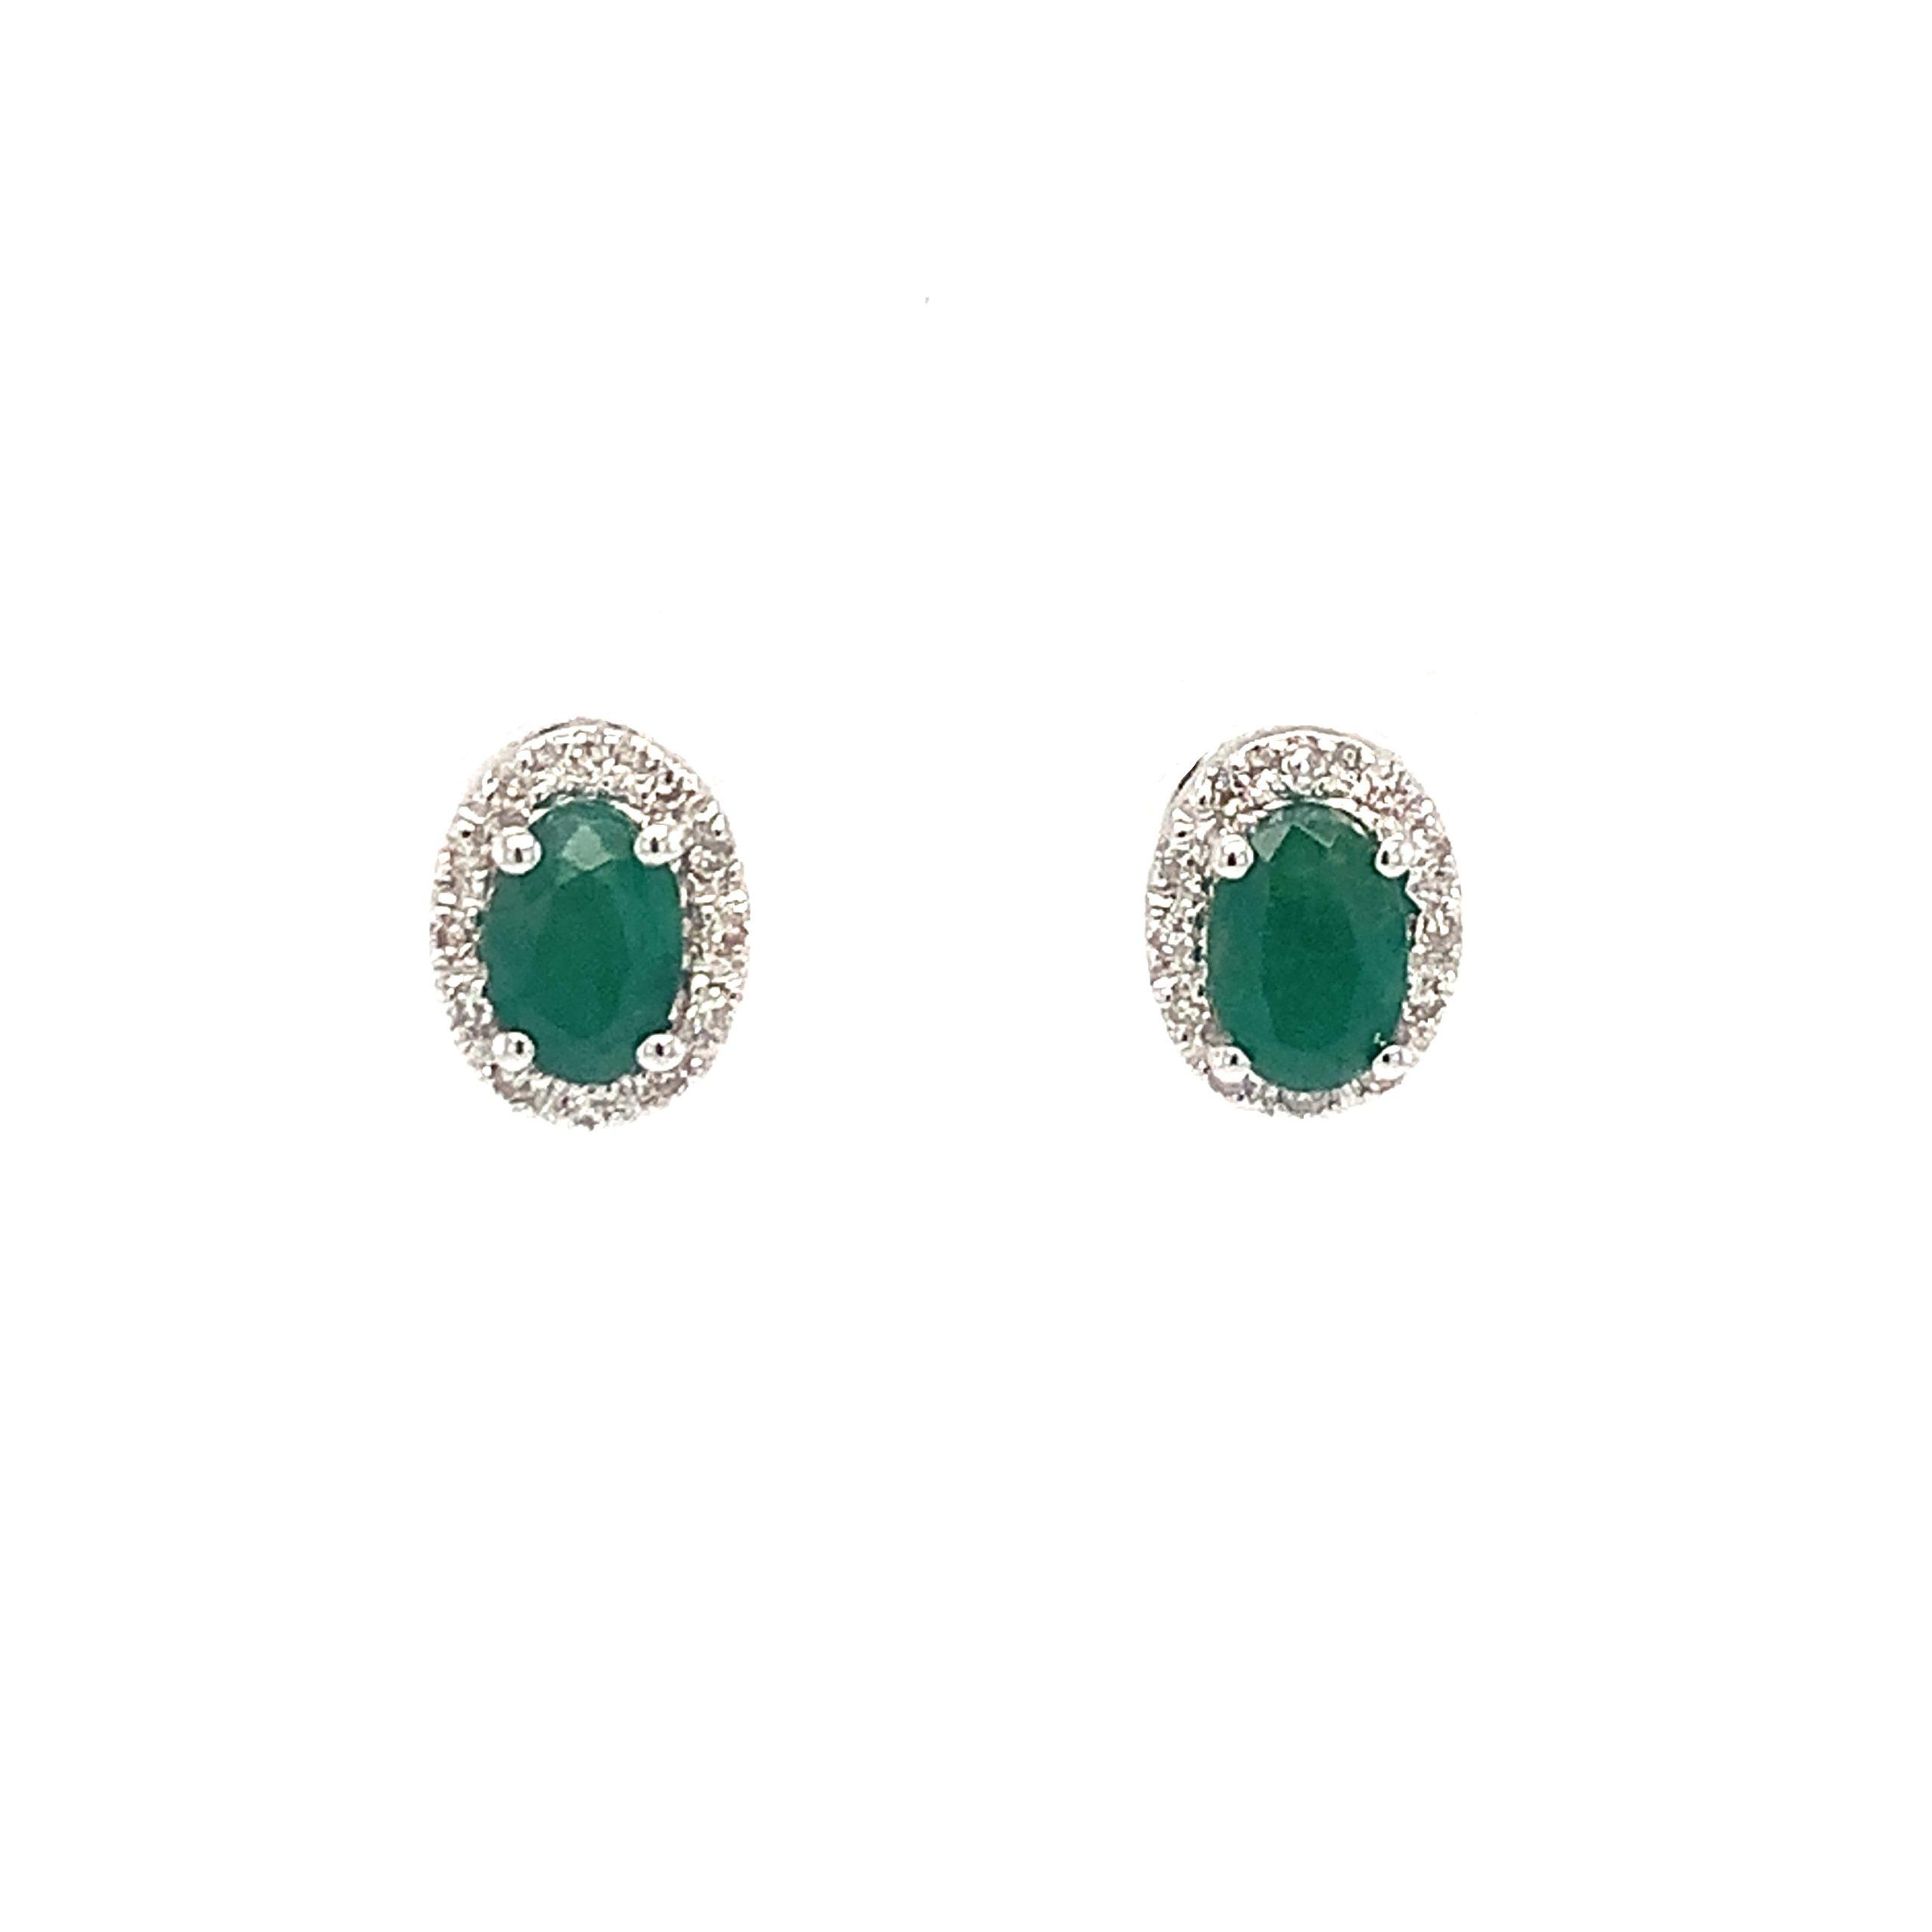 White Gold Emerald Earrings